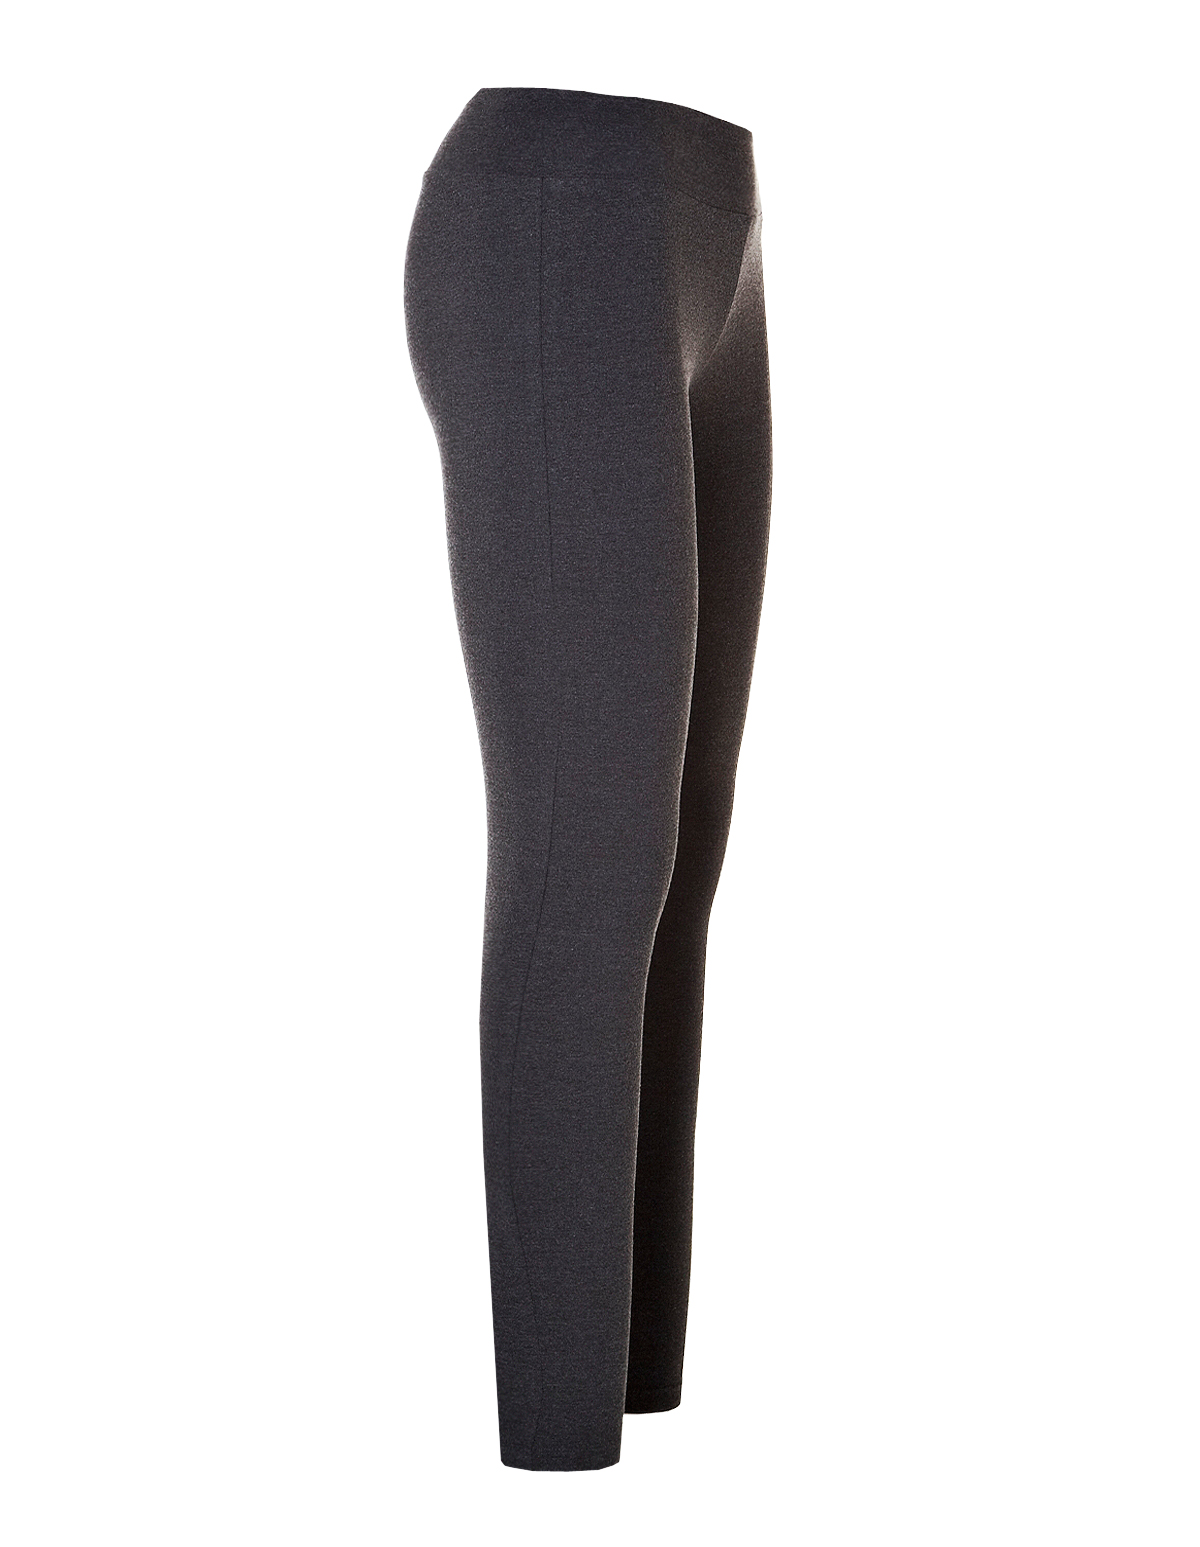 top design hot product kid Charcoal Grey Legging | Cleo